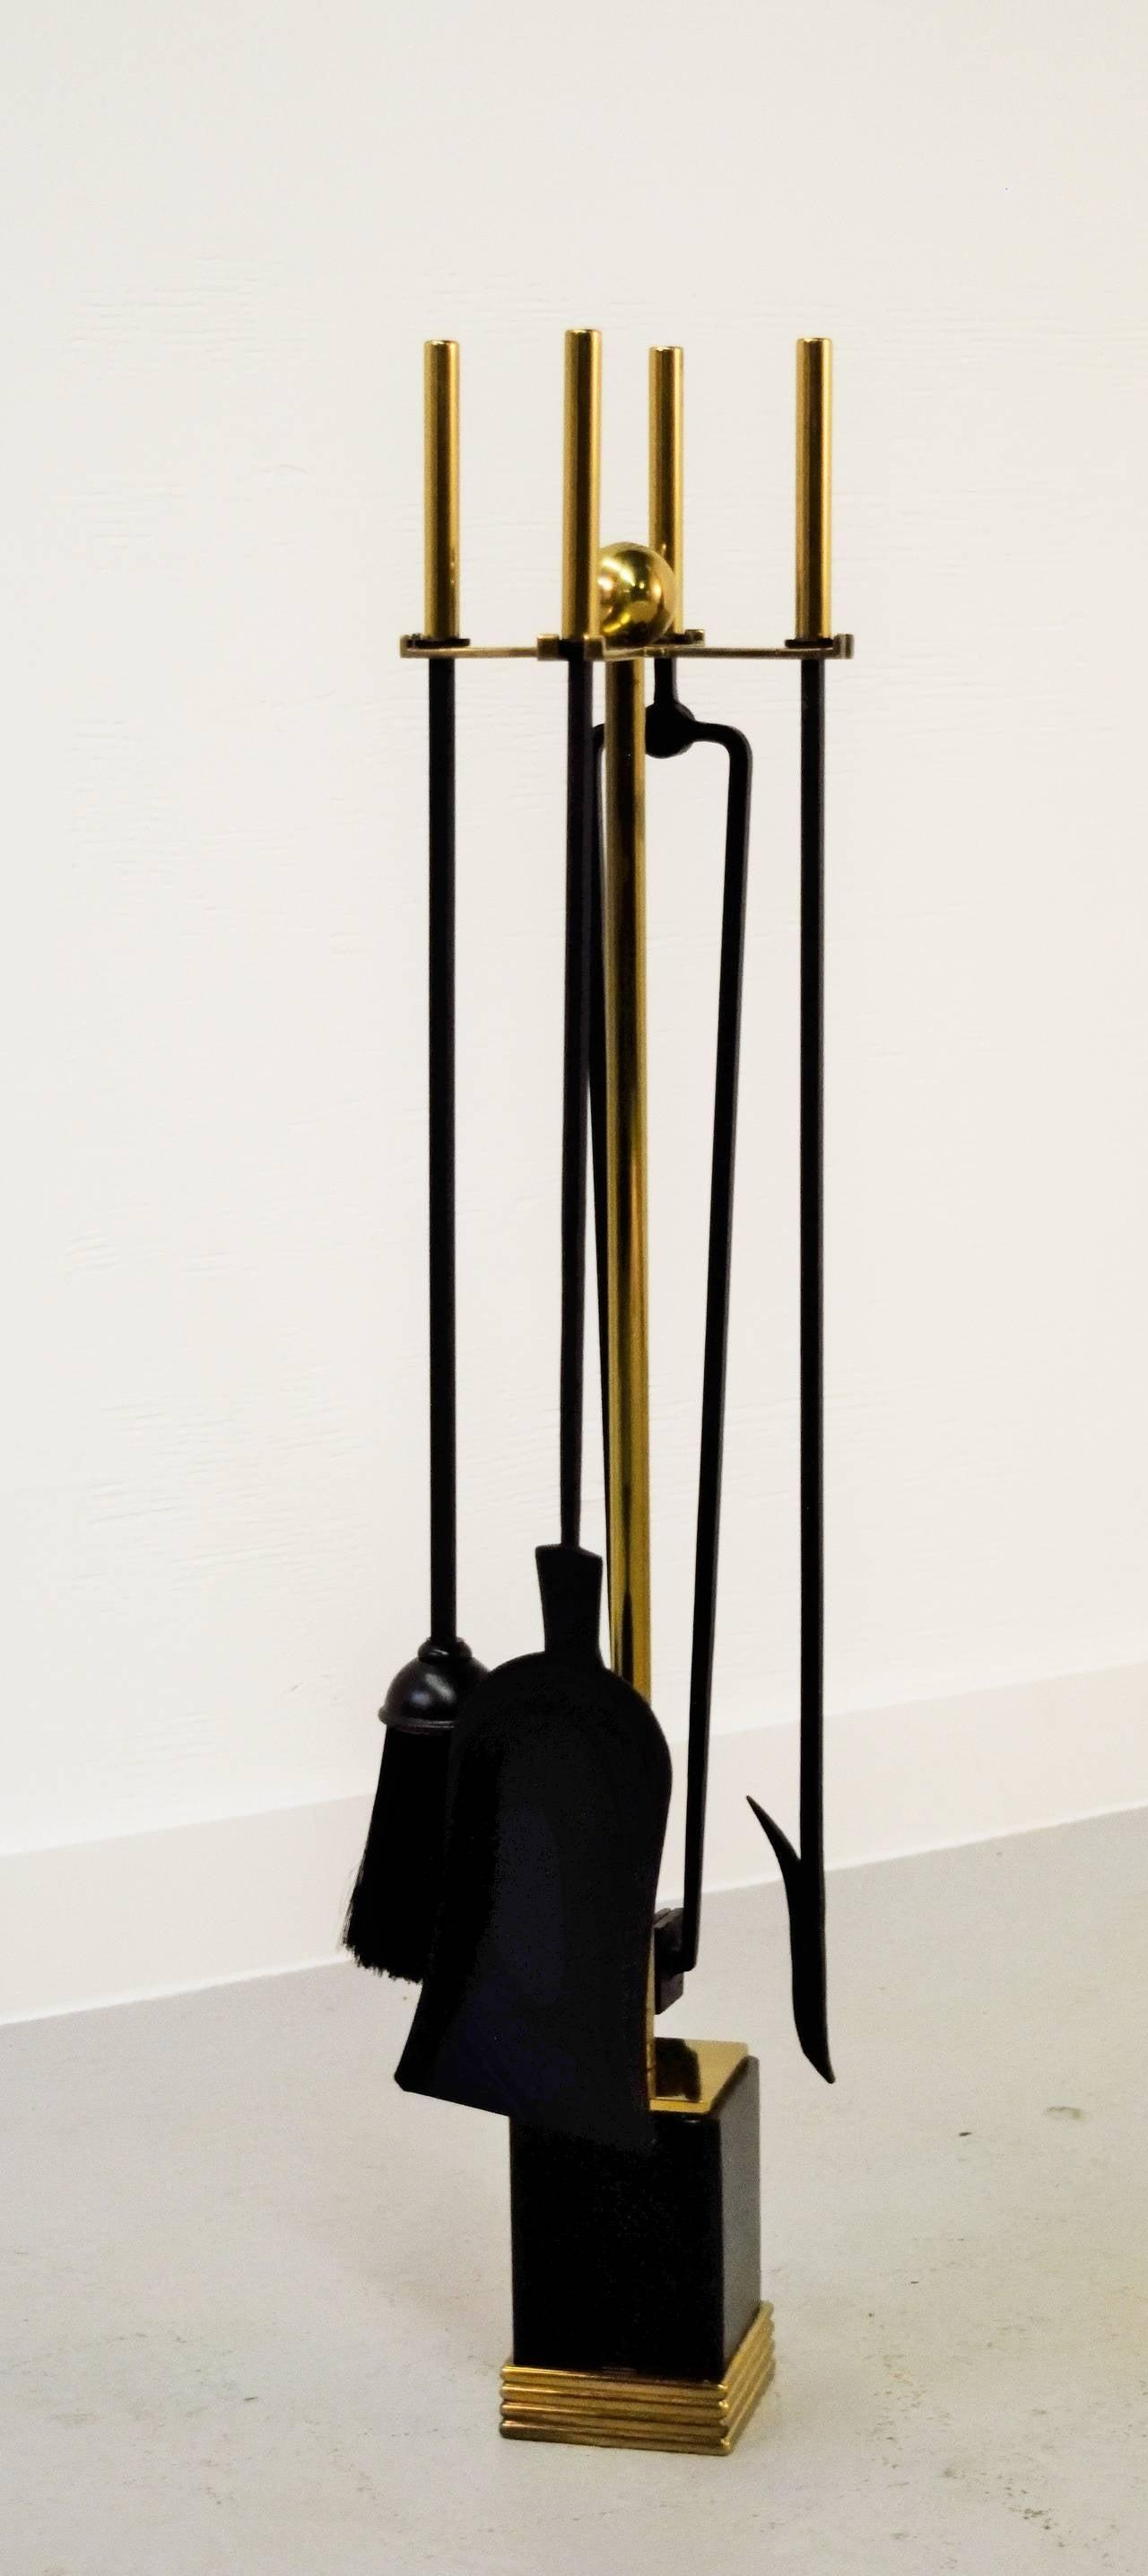 William H Jackson New York Ny Modernist Fireplace Tool Set